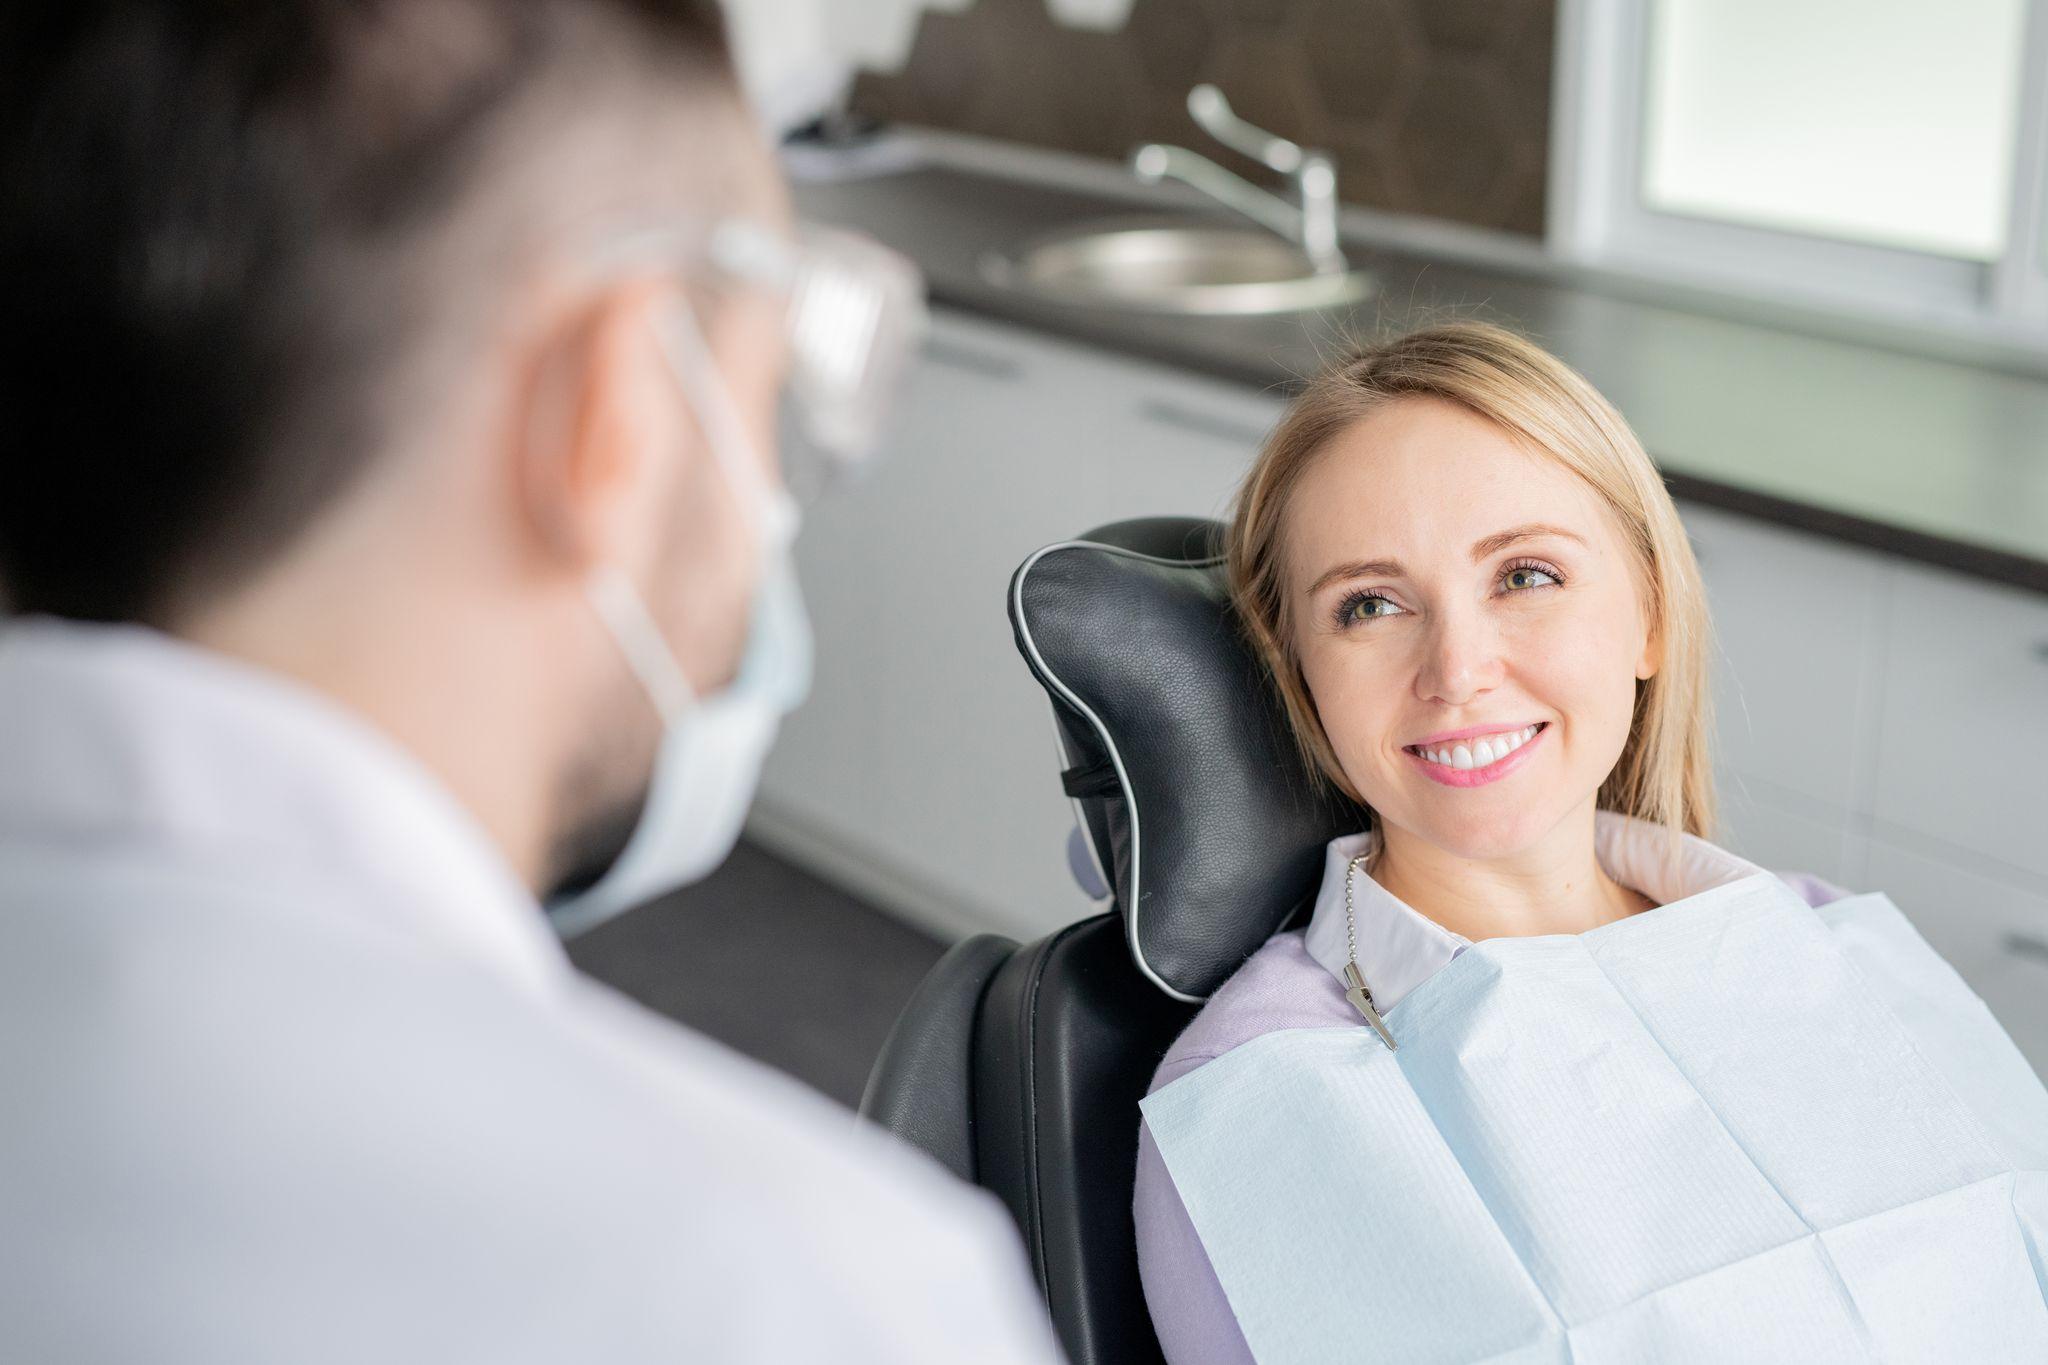 Best Endodontist Near Me